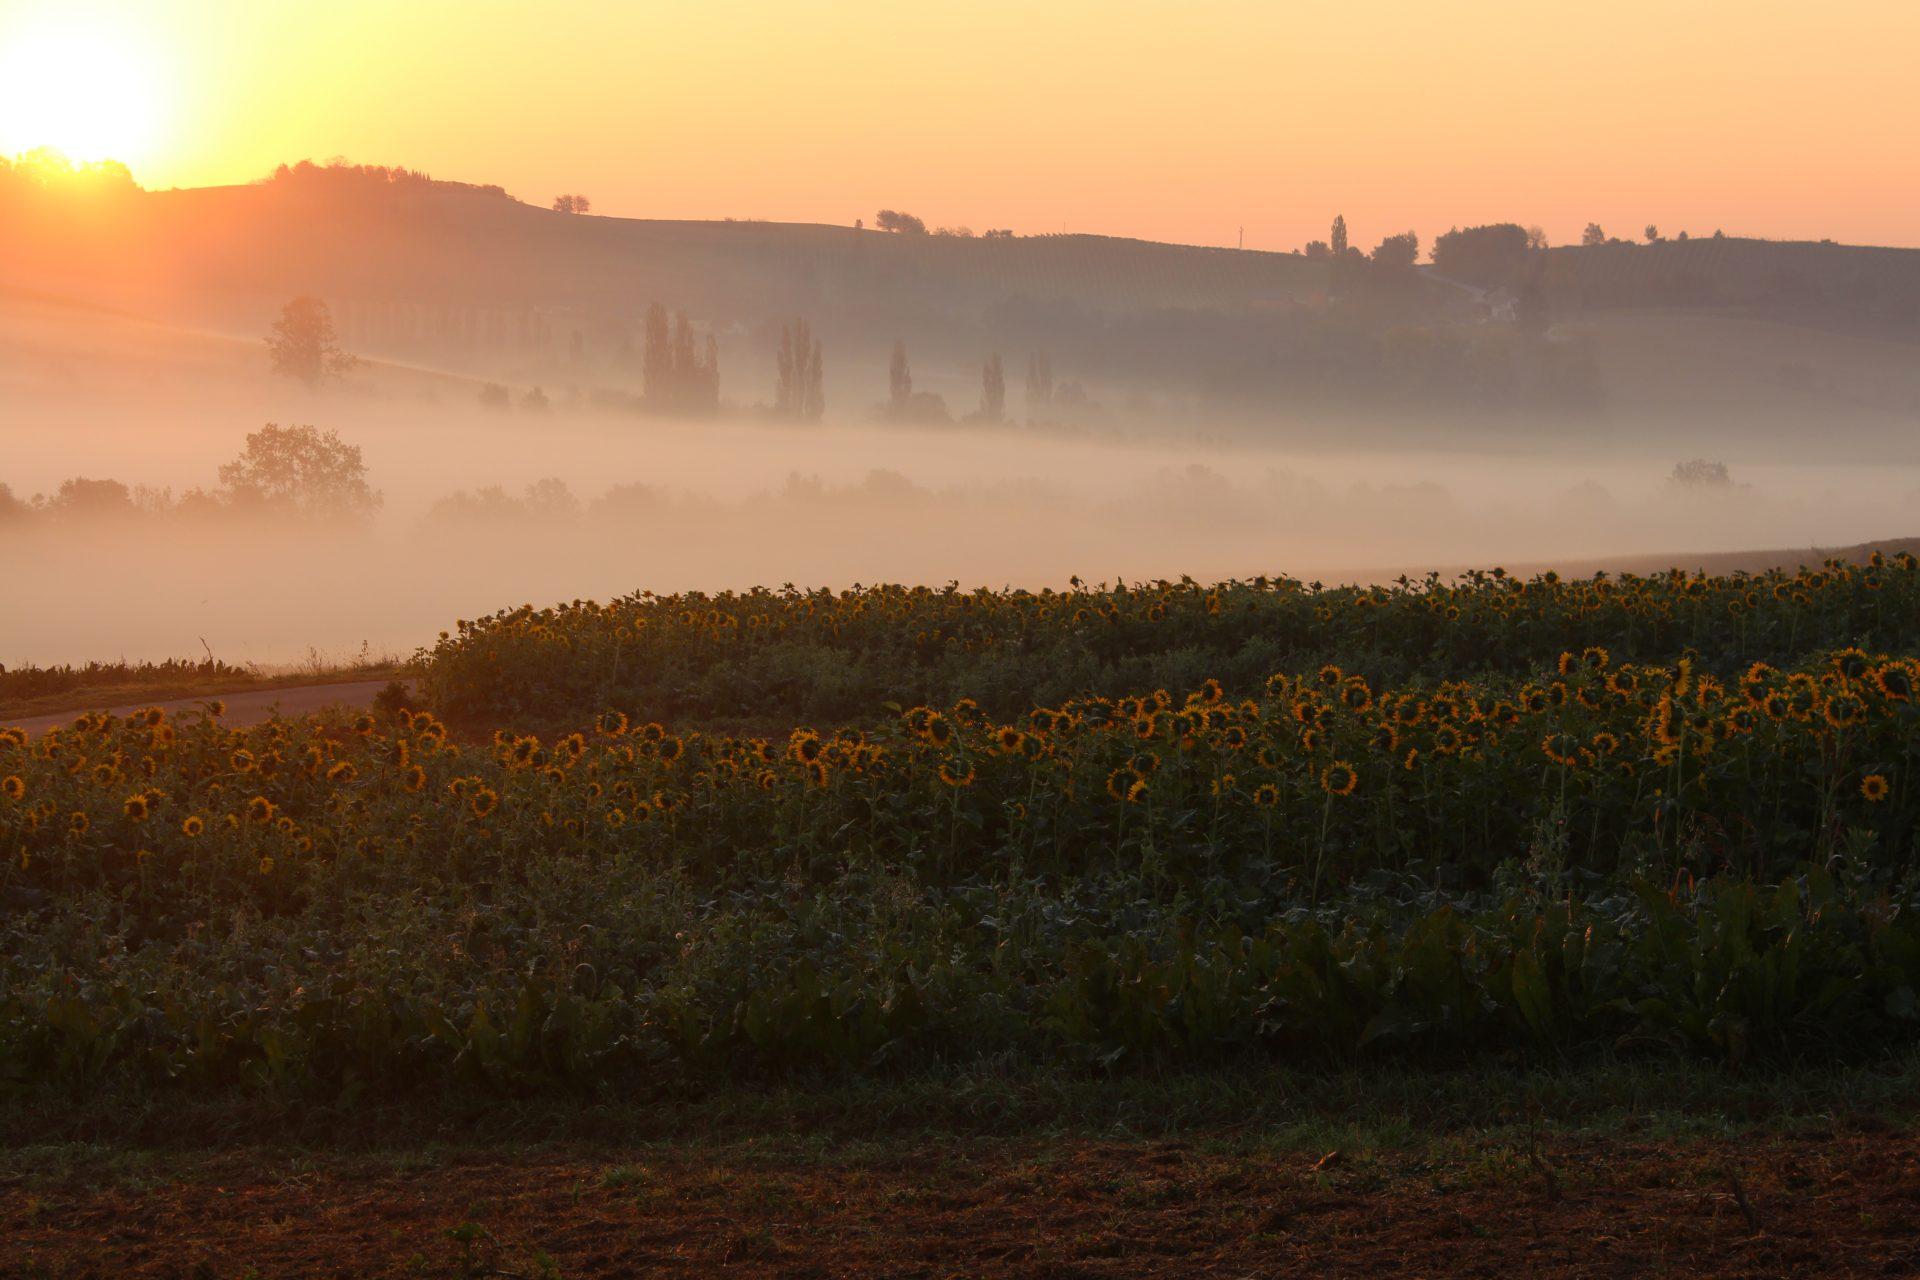 Sonnenblumenfeld im Nebel